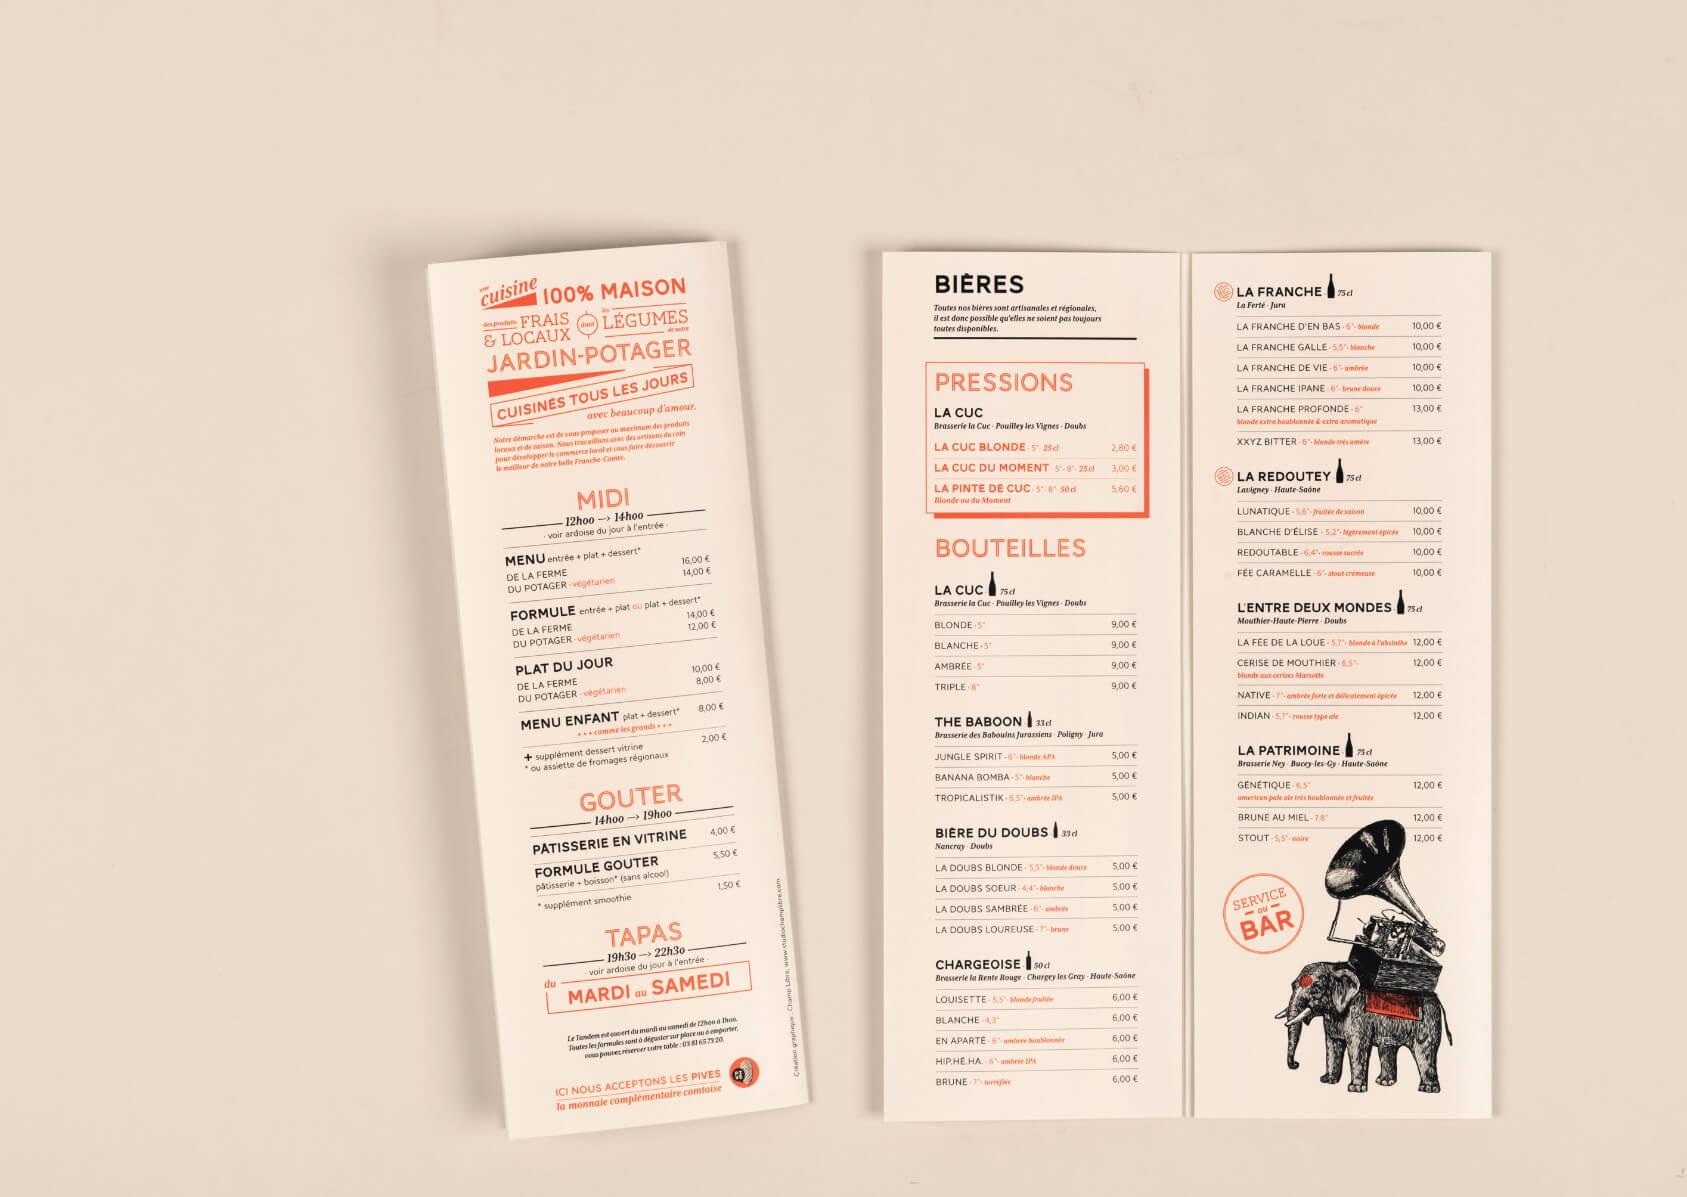 menu du tandem, bar et restaurant